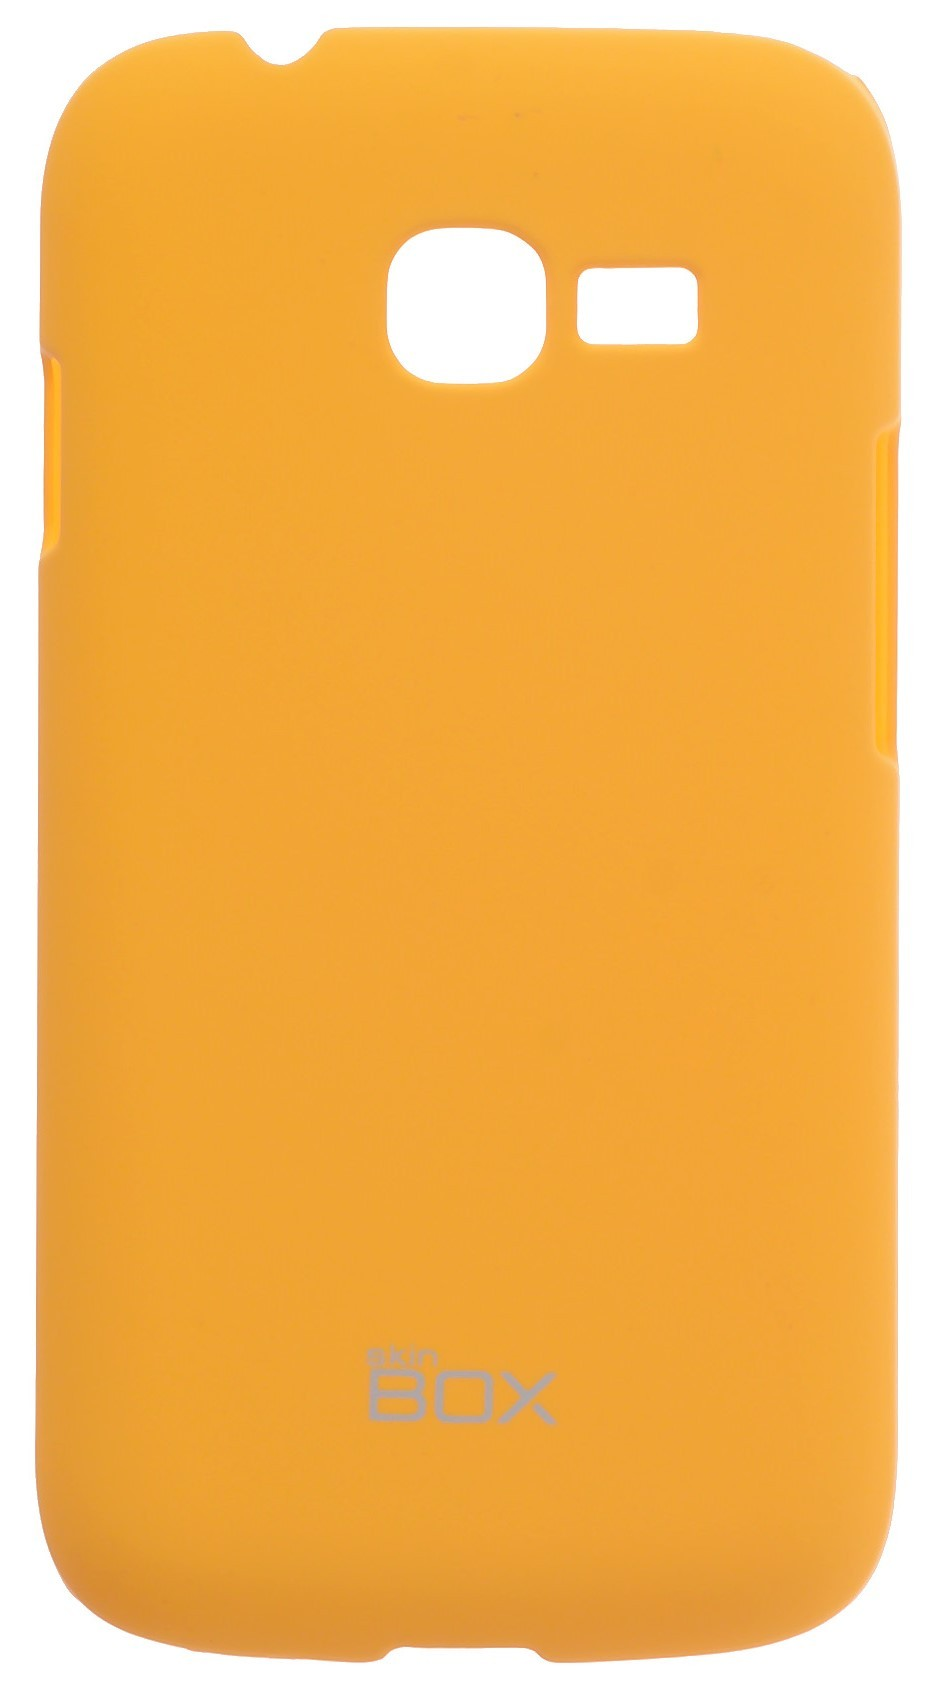 Чехол для сотового телефона skinBOX 4People, 4630042524460, желтый чехол для сотового телефона skinbox 4people 4630042526730 желтый